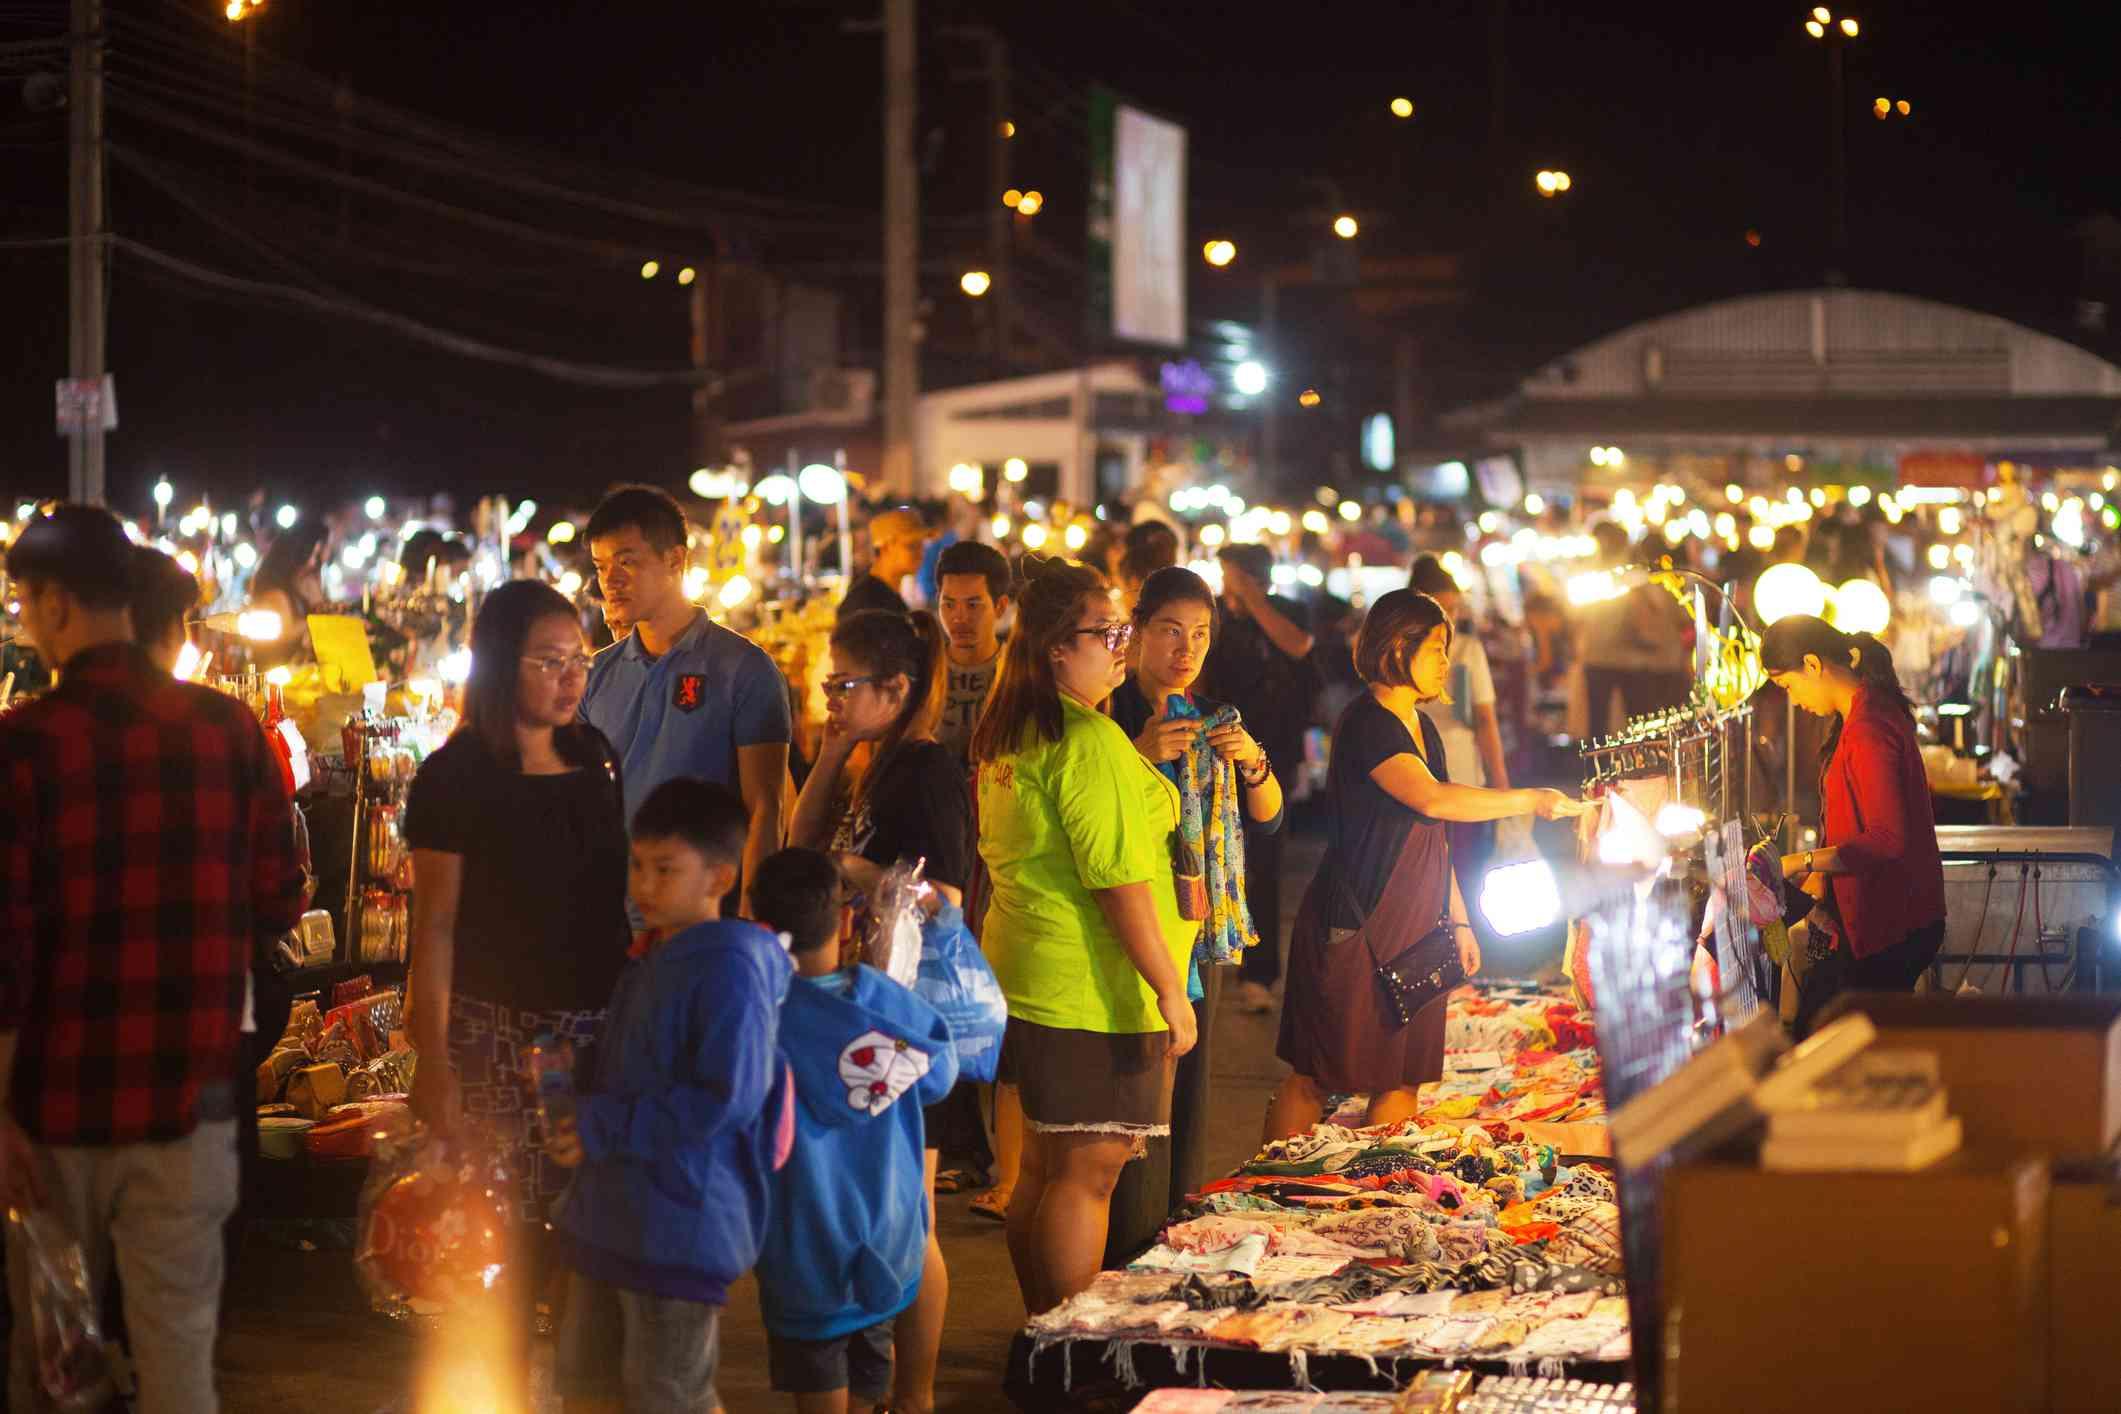 Lian Duan Market